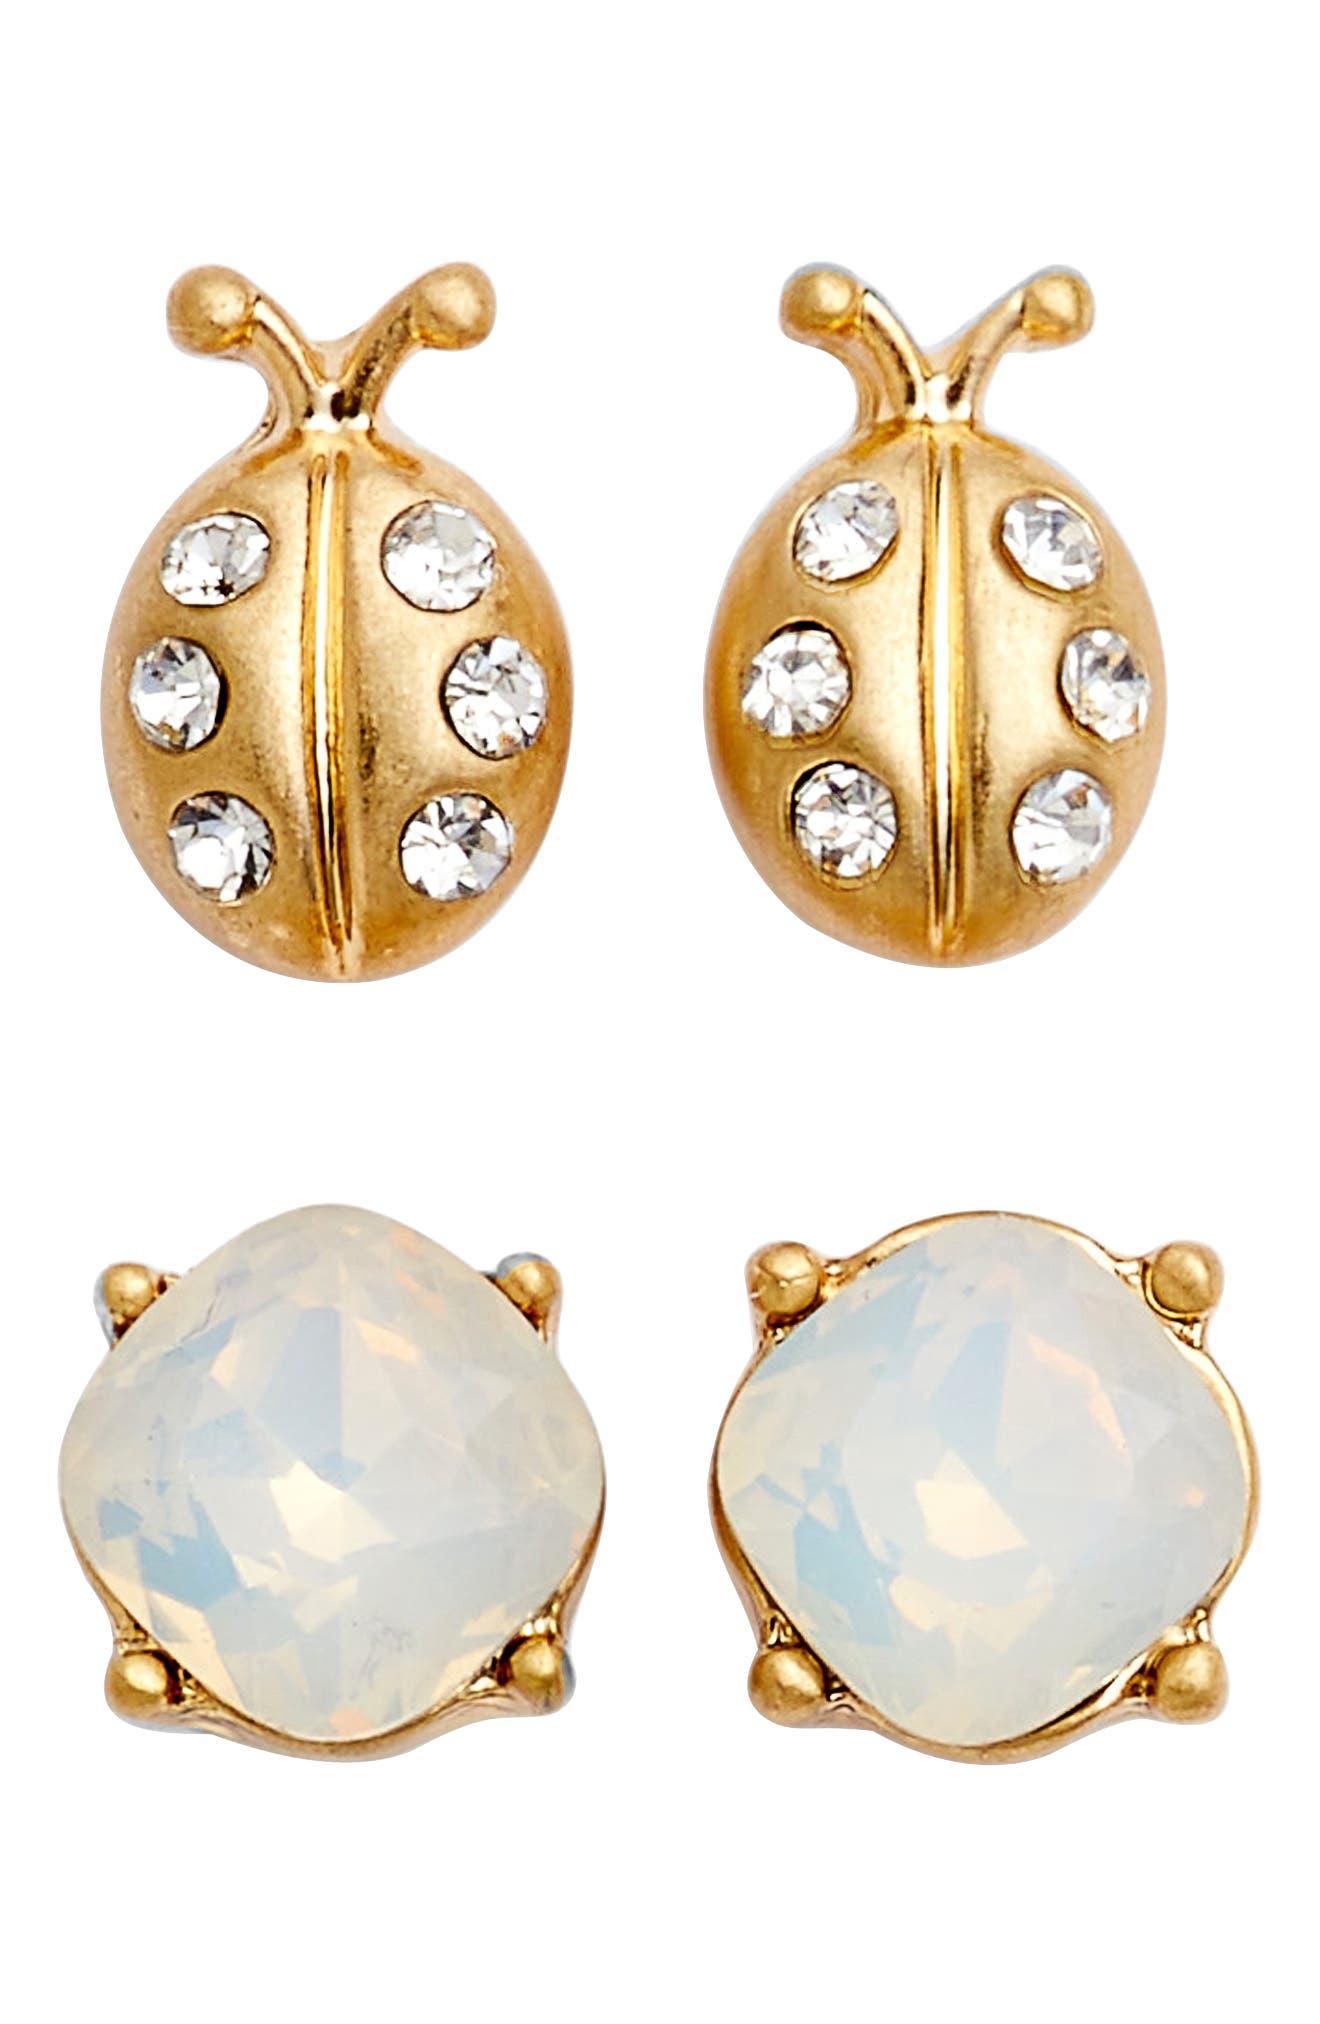 Set of 2 Jeweled Ladybug Earrings,                             Main thumbnail 1, color,